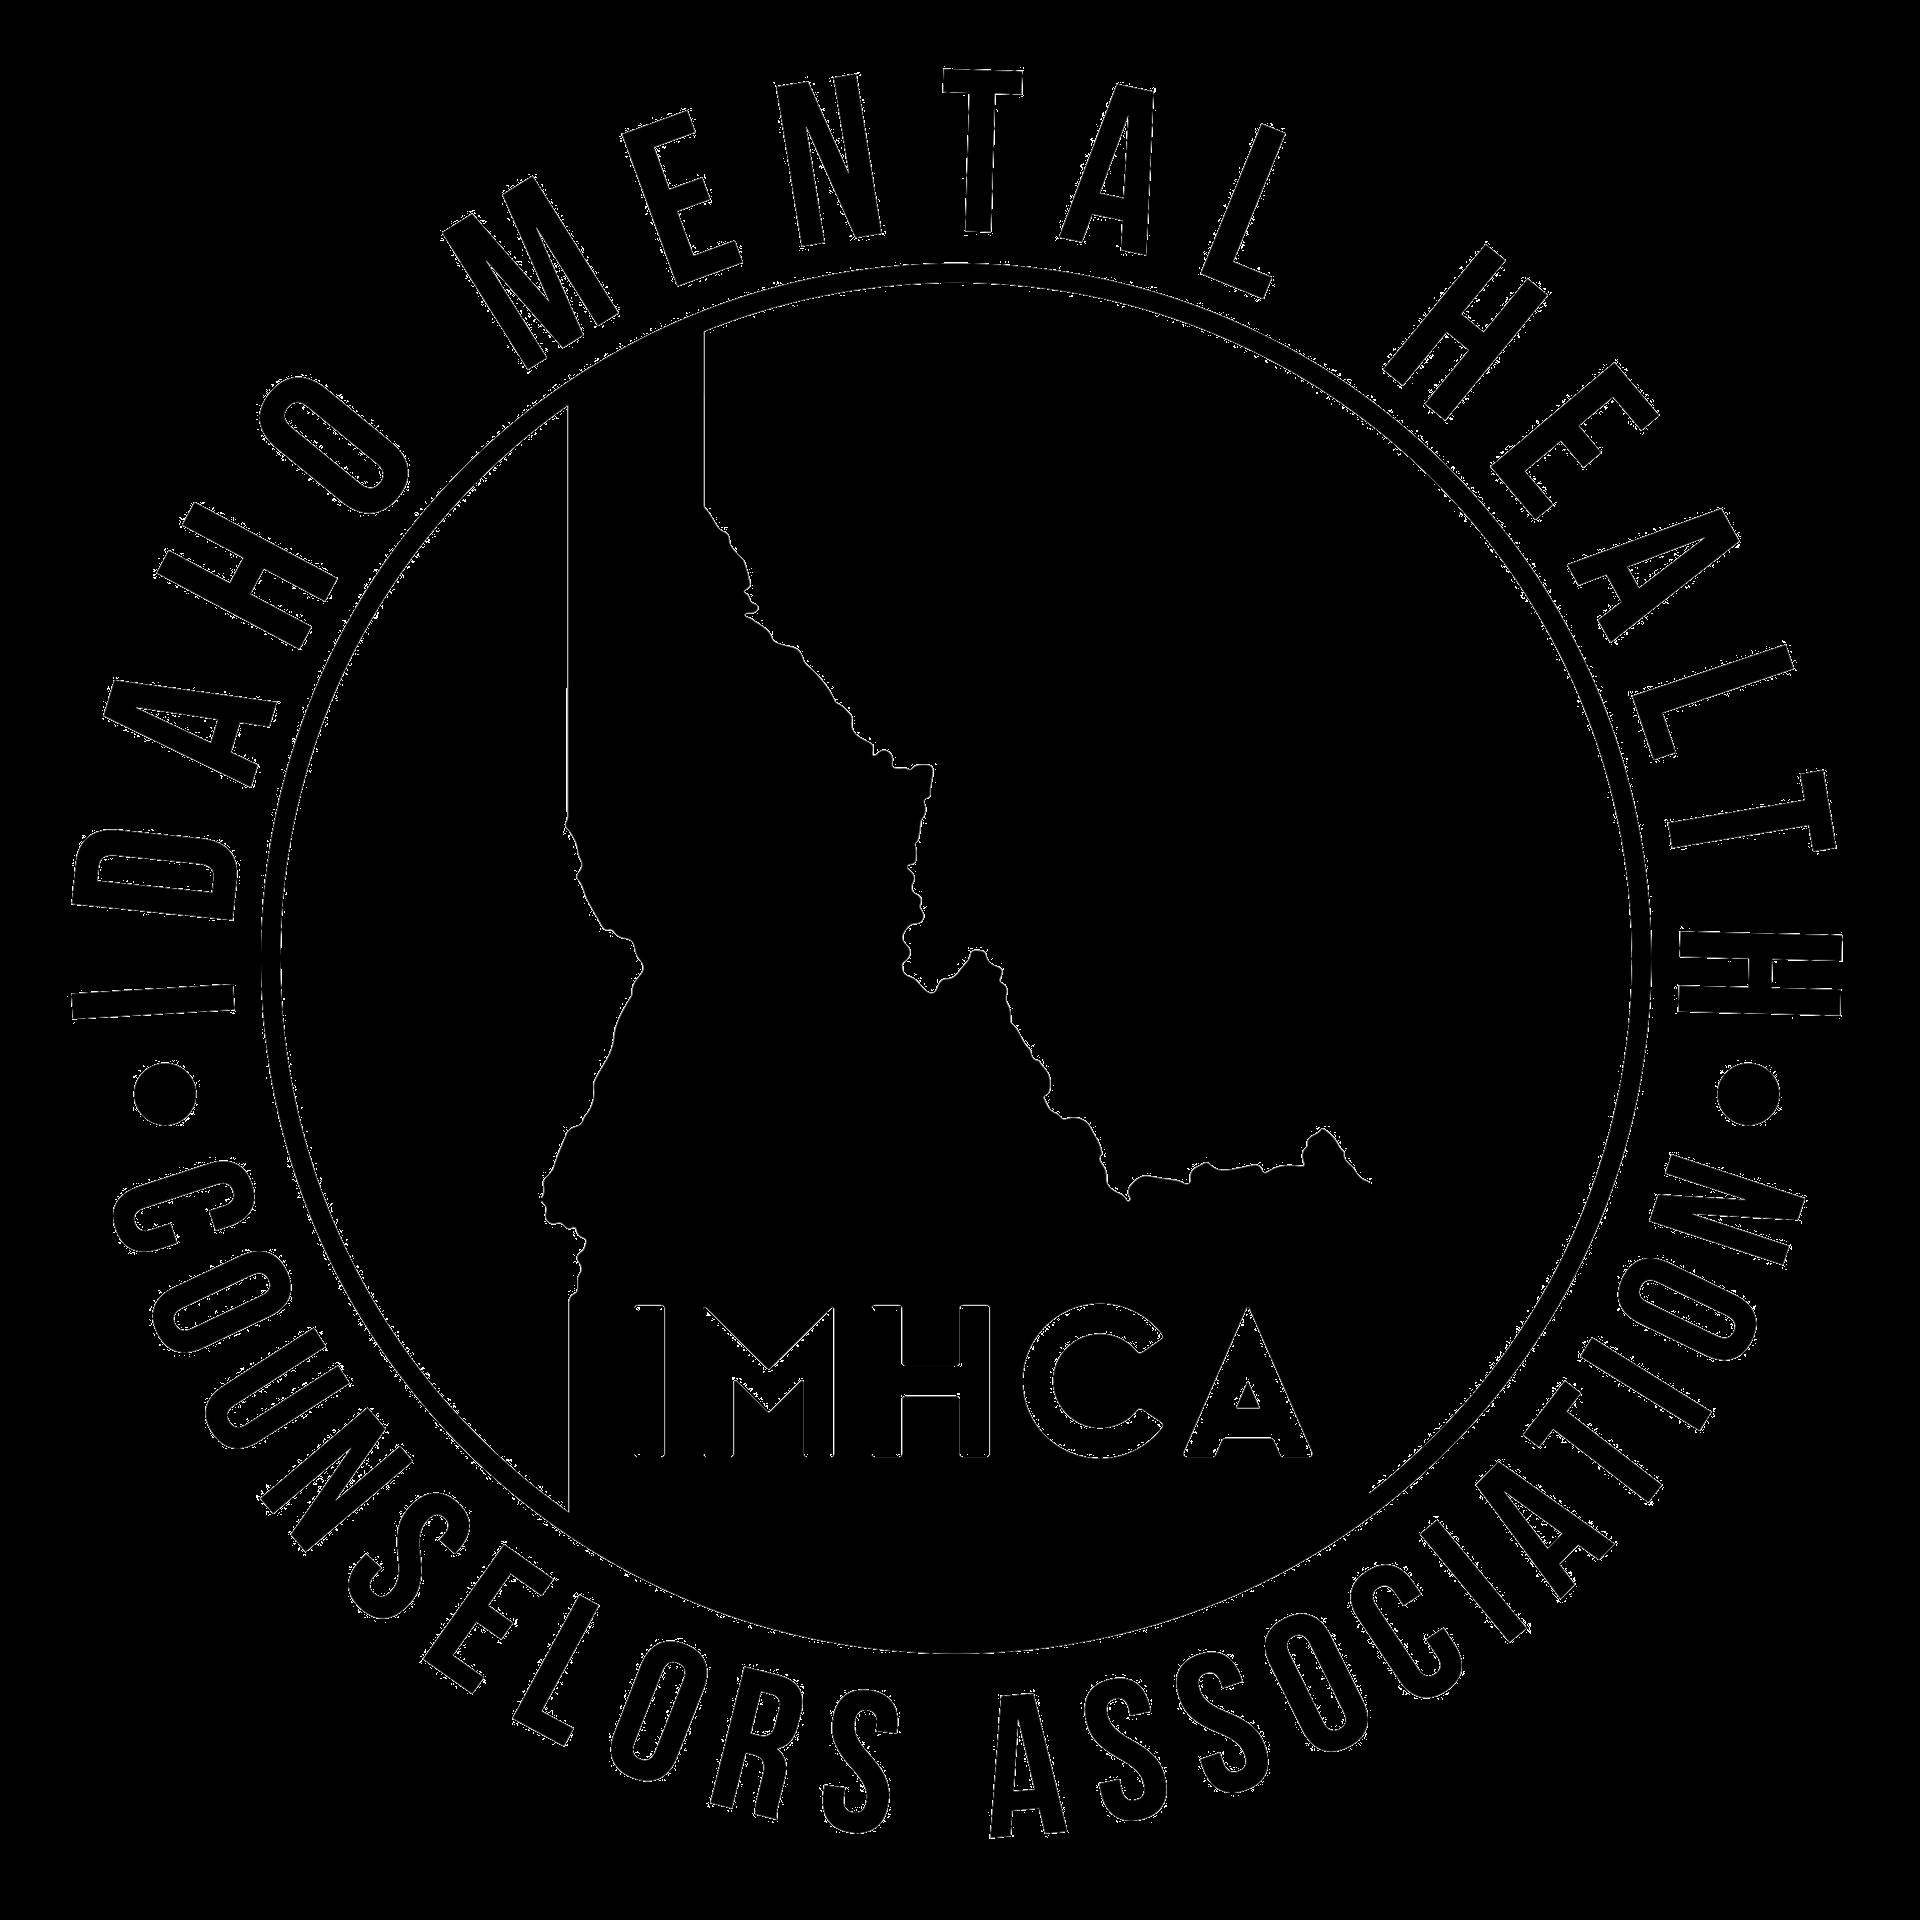 Idaho Mental Health Counselors Association